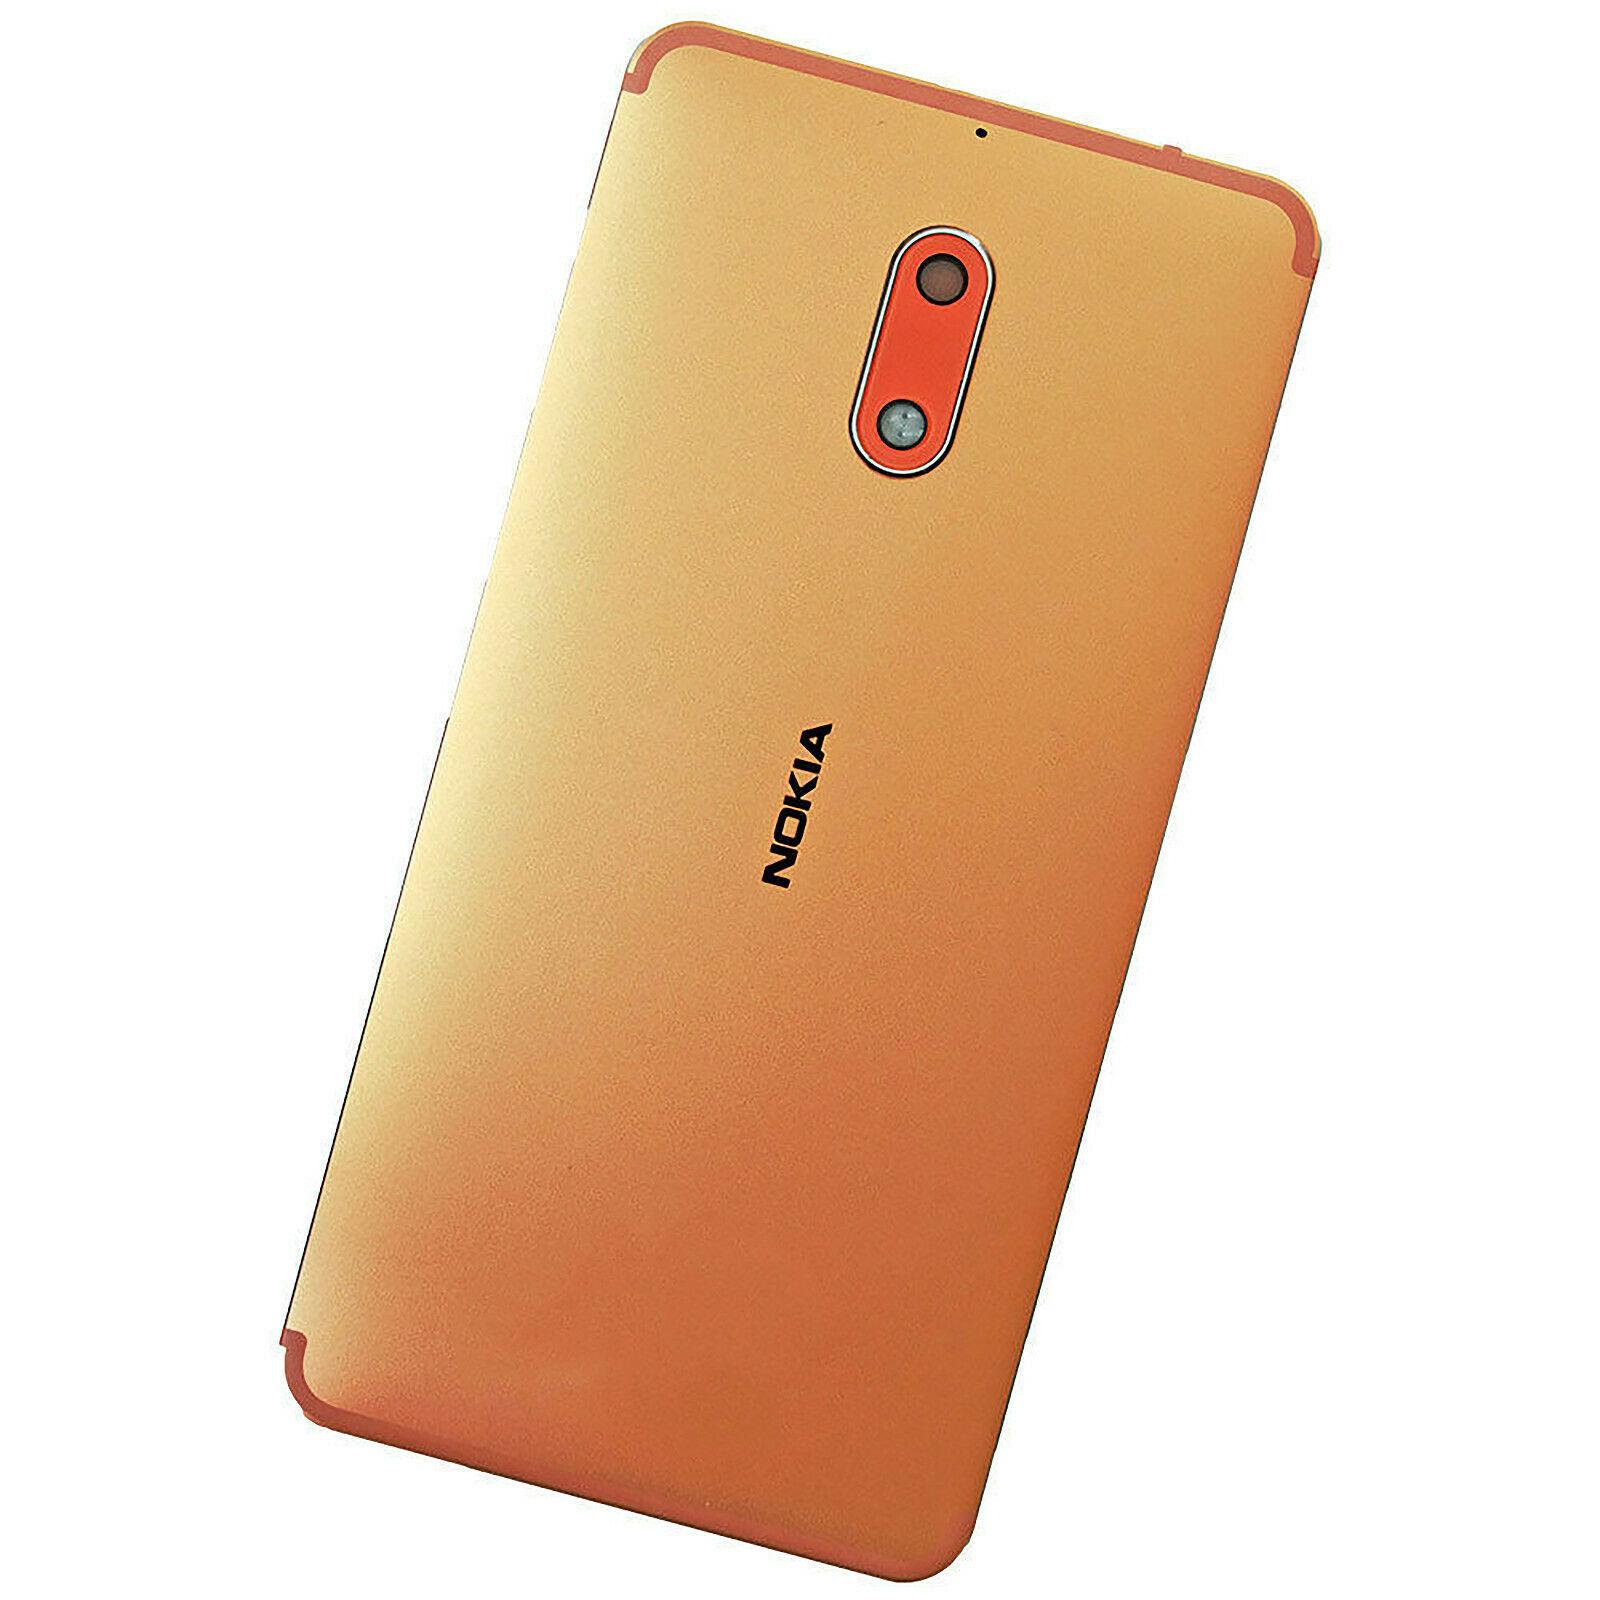 قاب-گوشی-موبایل-نوکیا-سیکس-Nokia-6..jpg